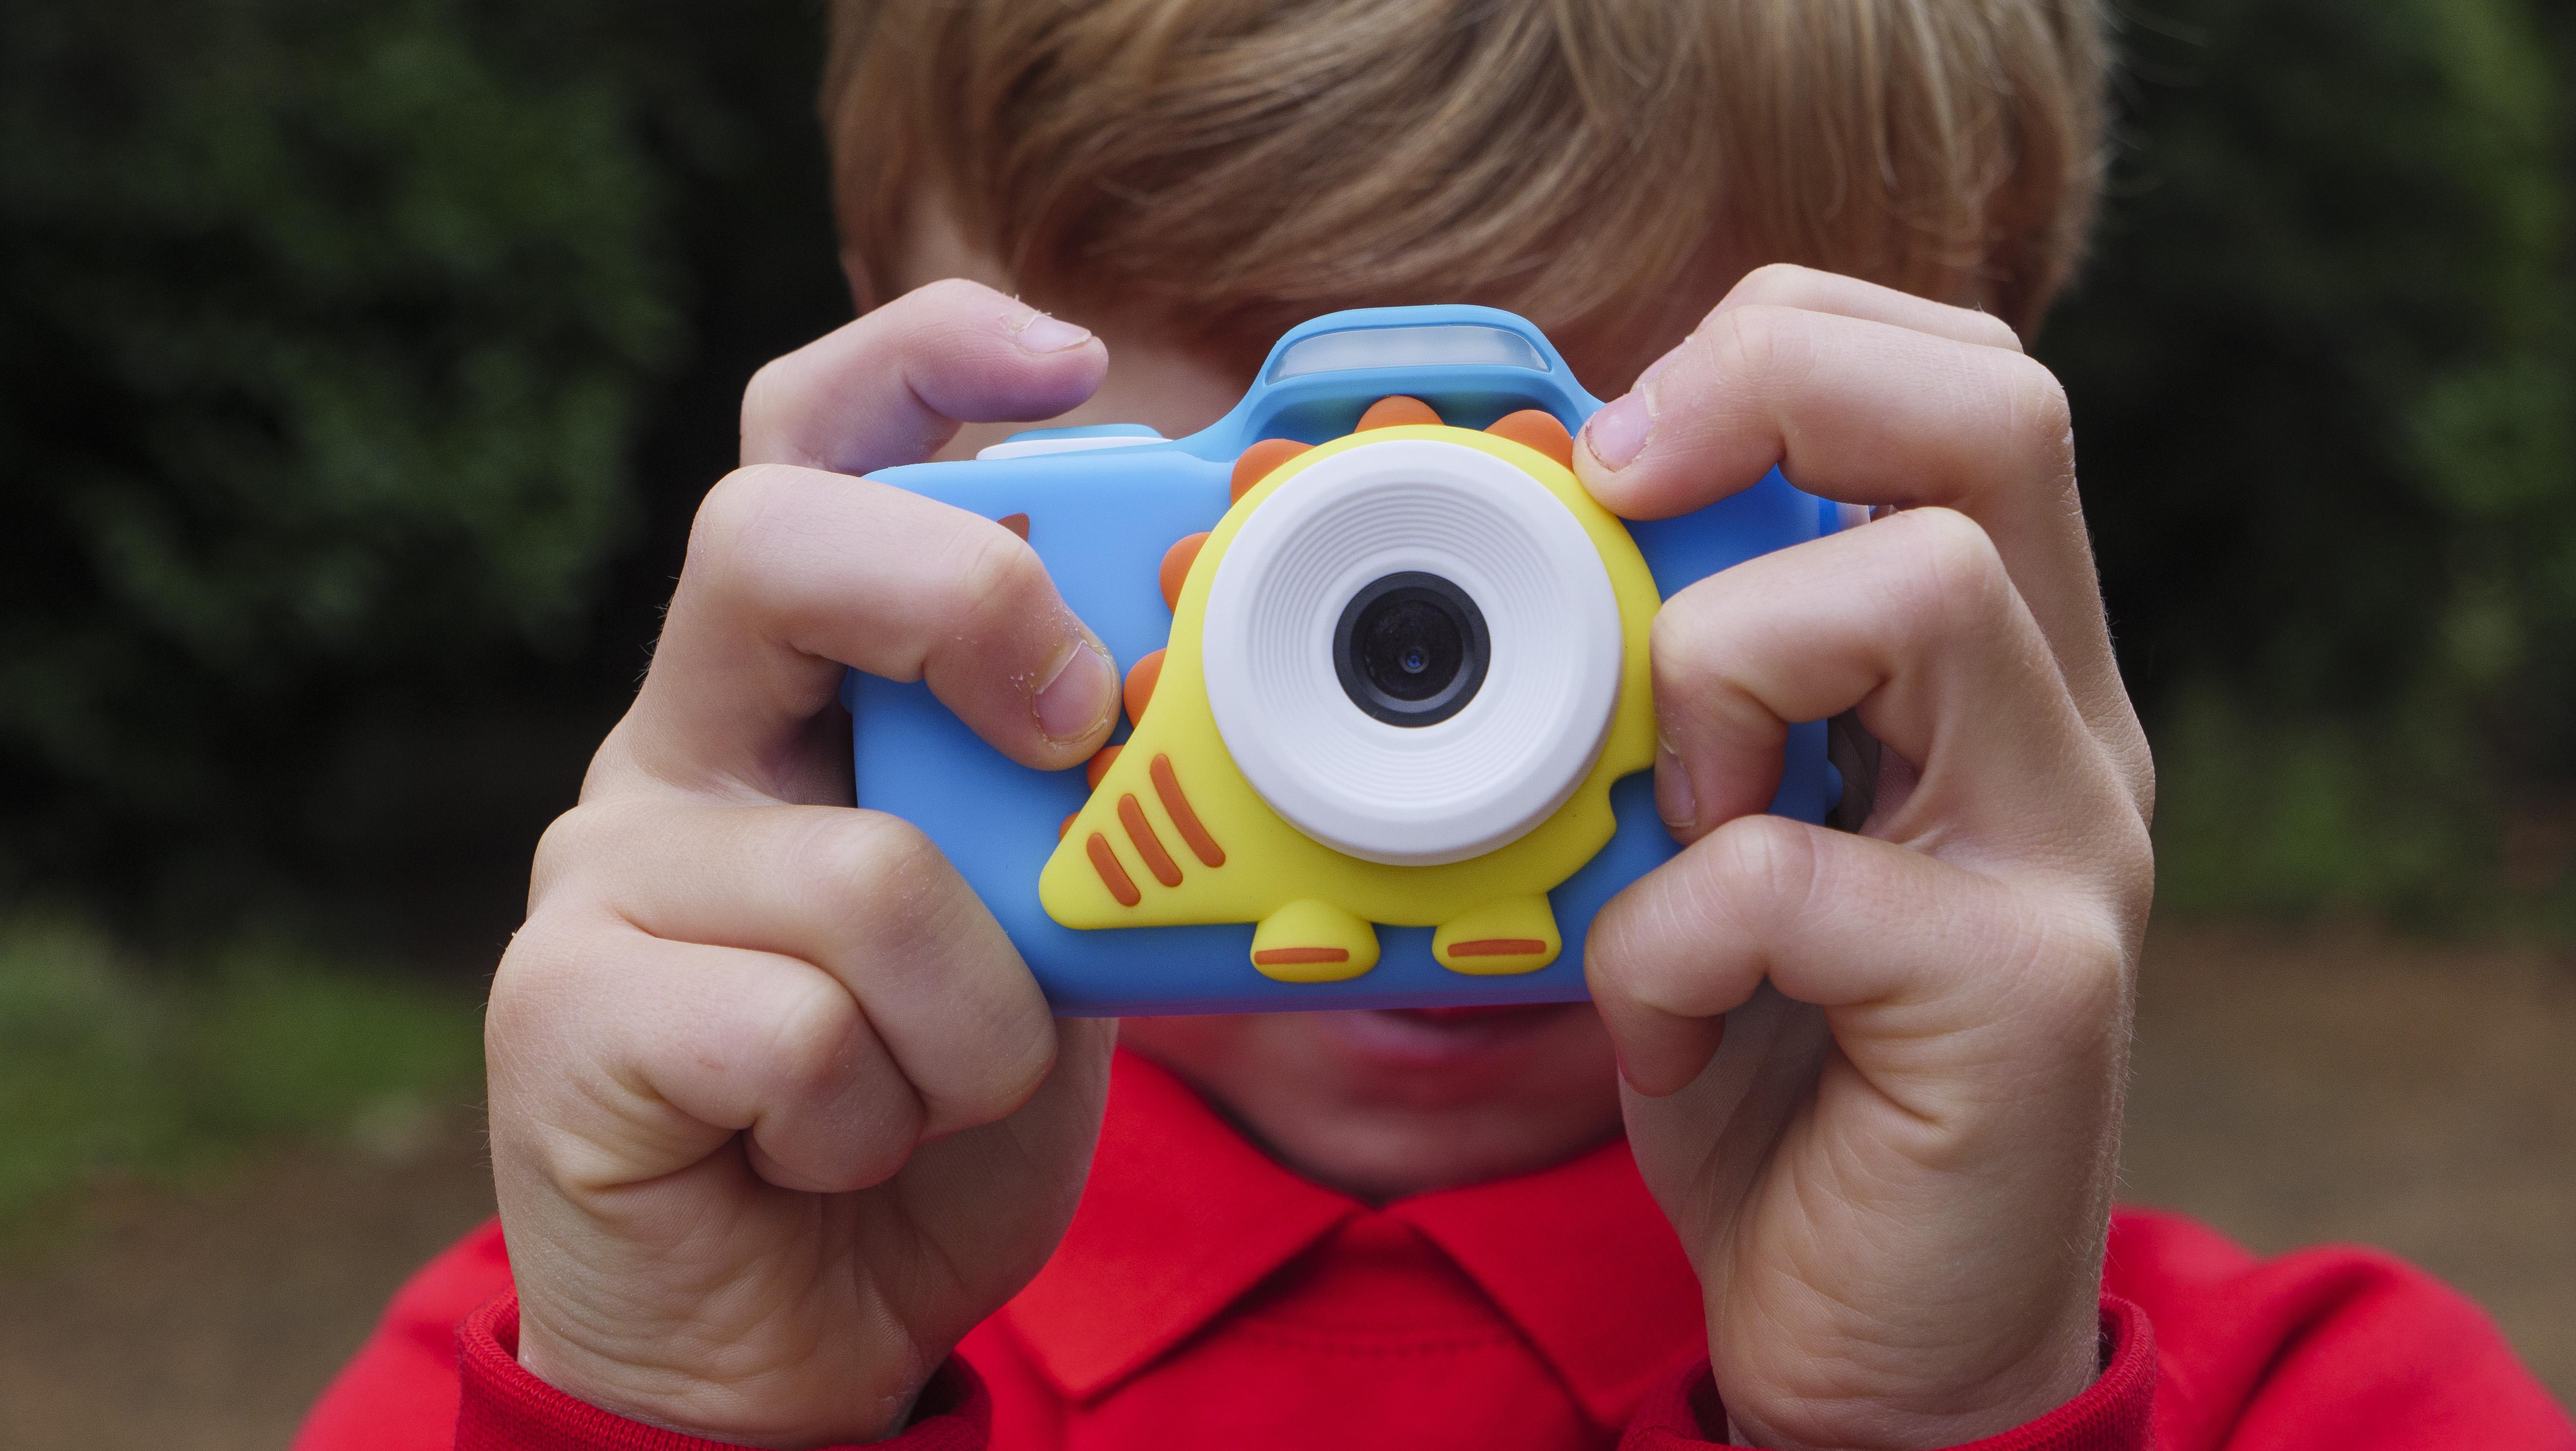 Best Cameras For Kids 2021 The 12 Best Cameras For Children And Teens Techradar